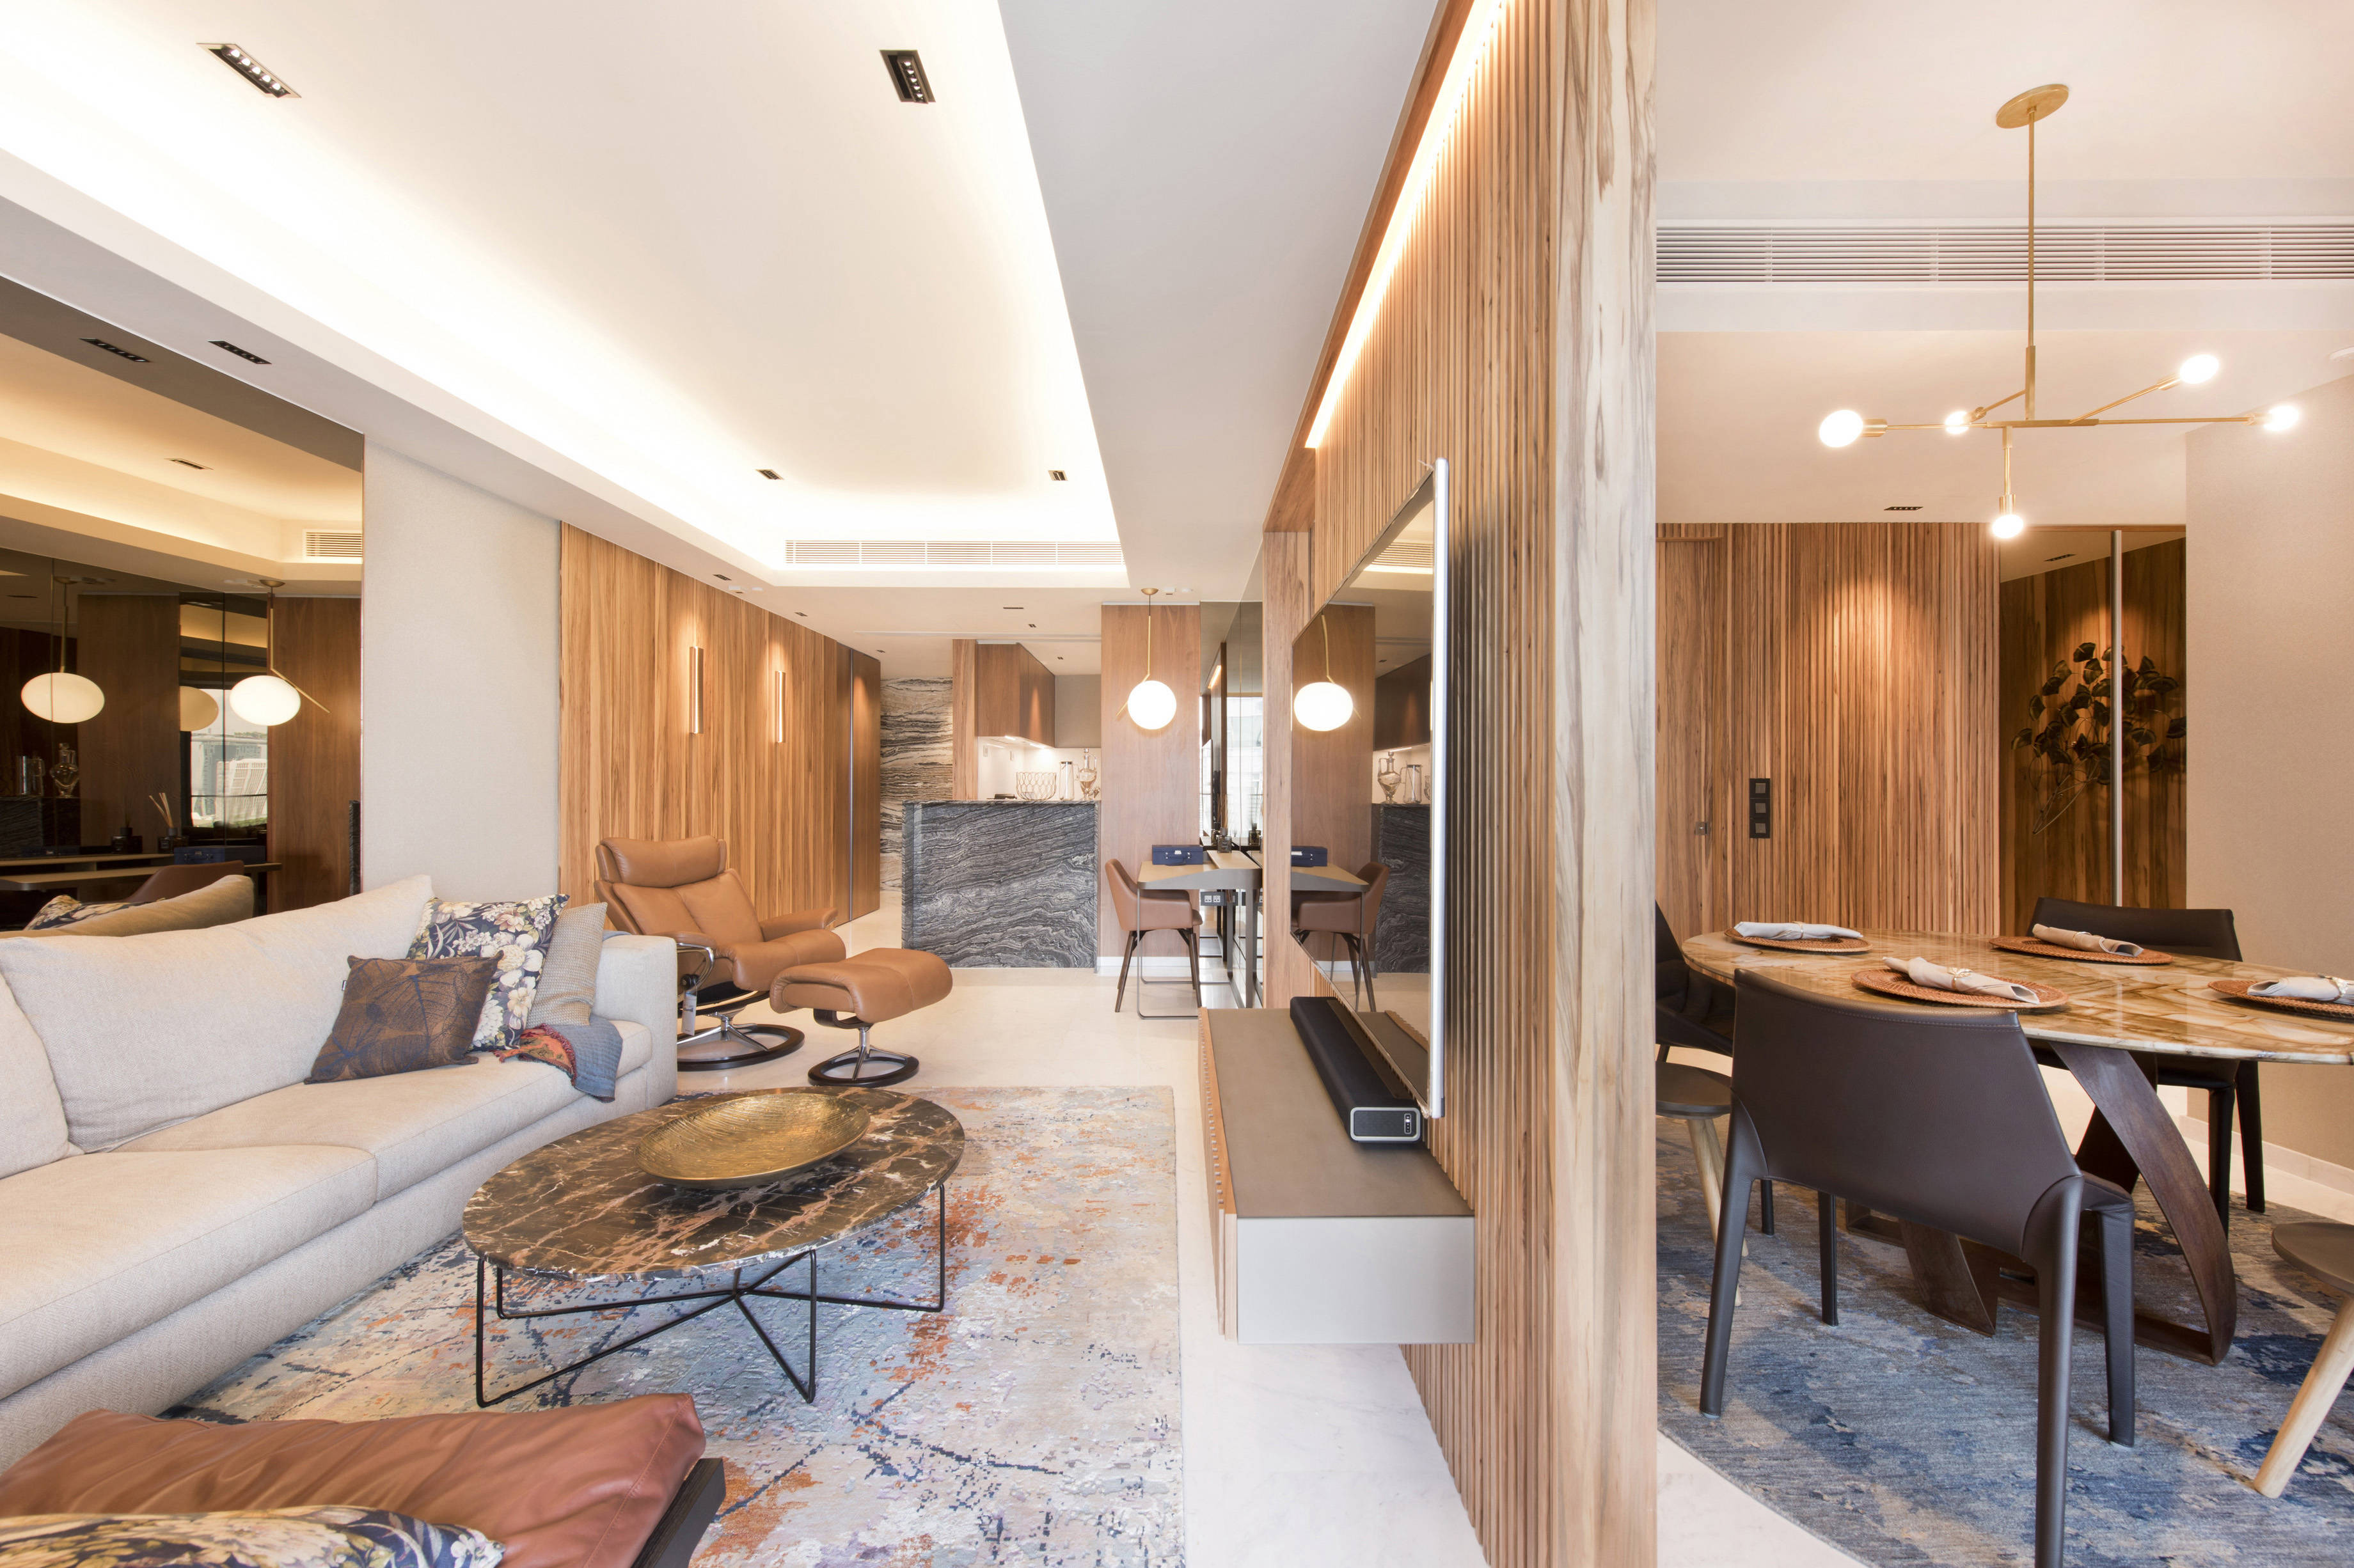 Being An Interior Designer announcing the lookbox design awards shortlist for interior design